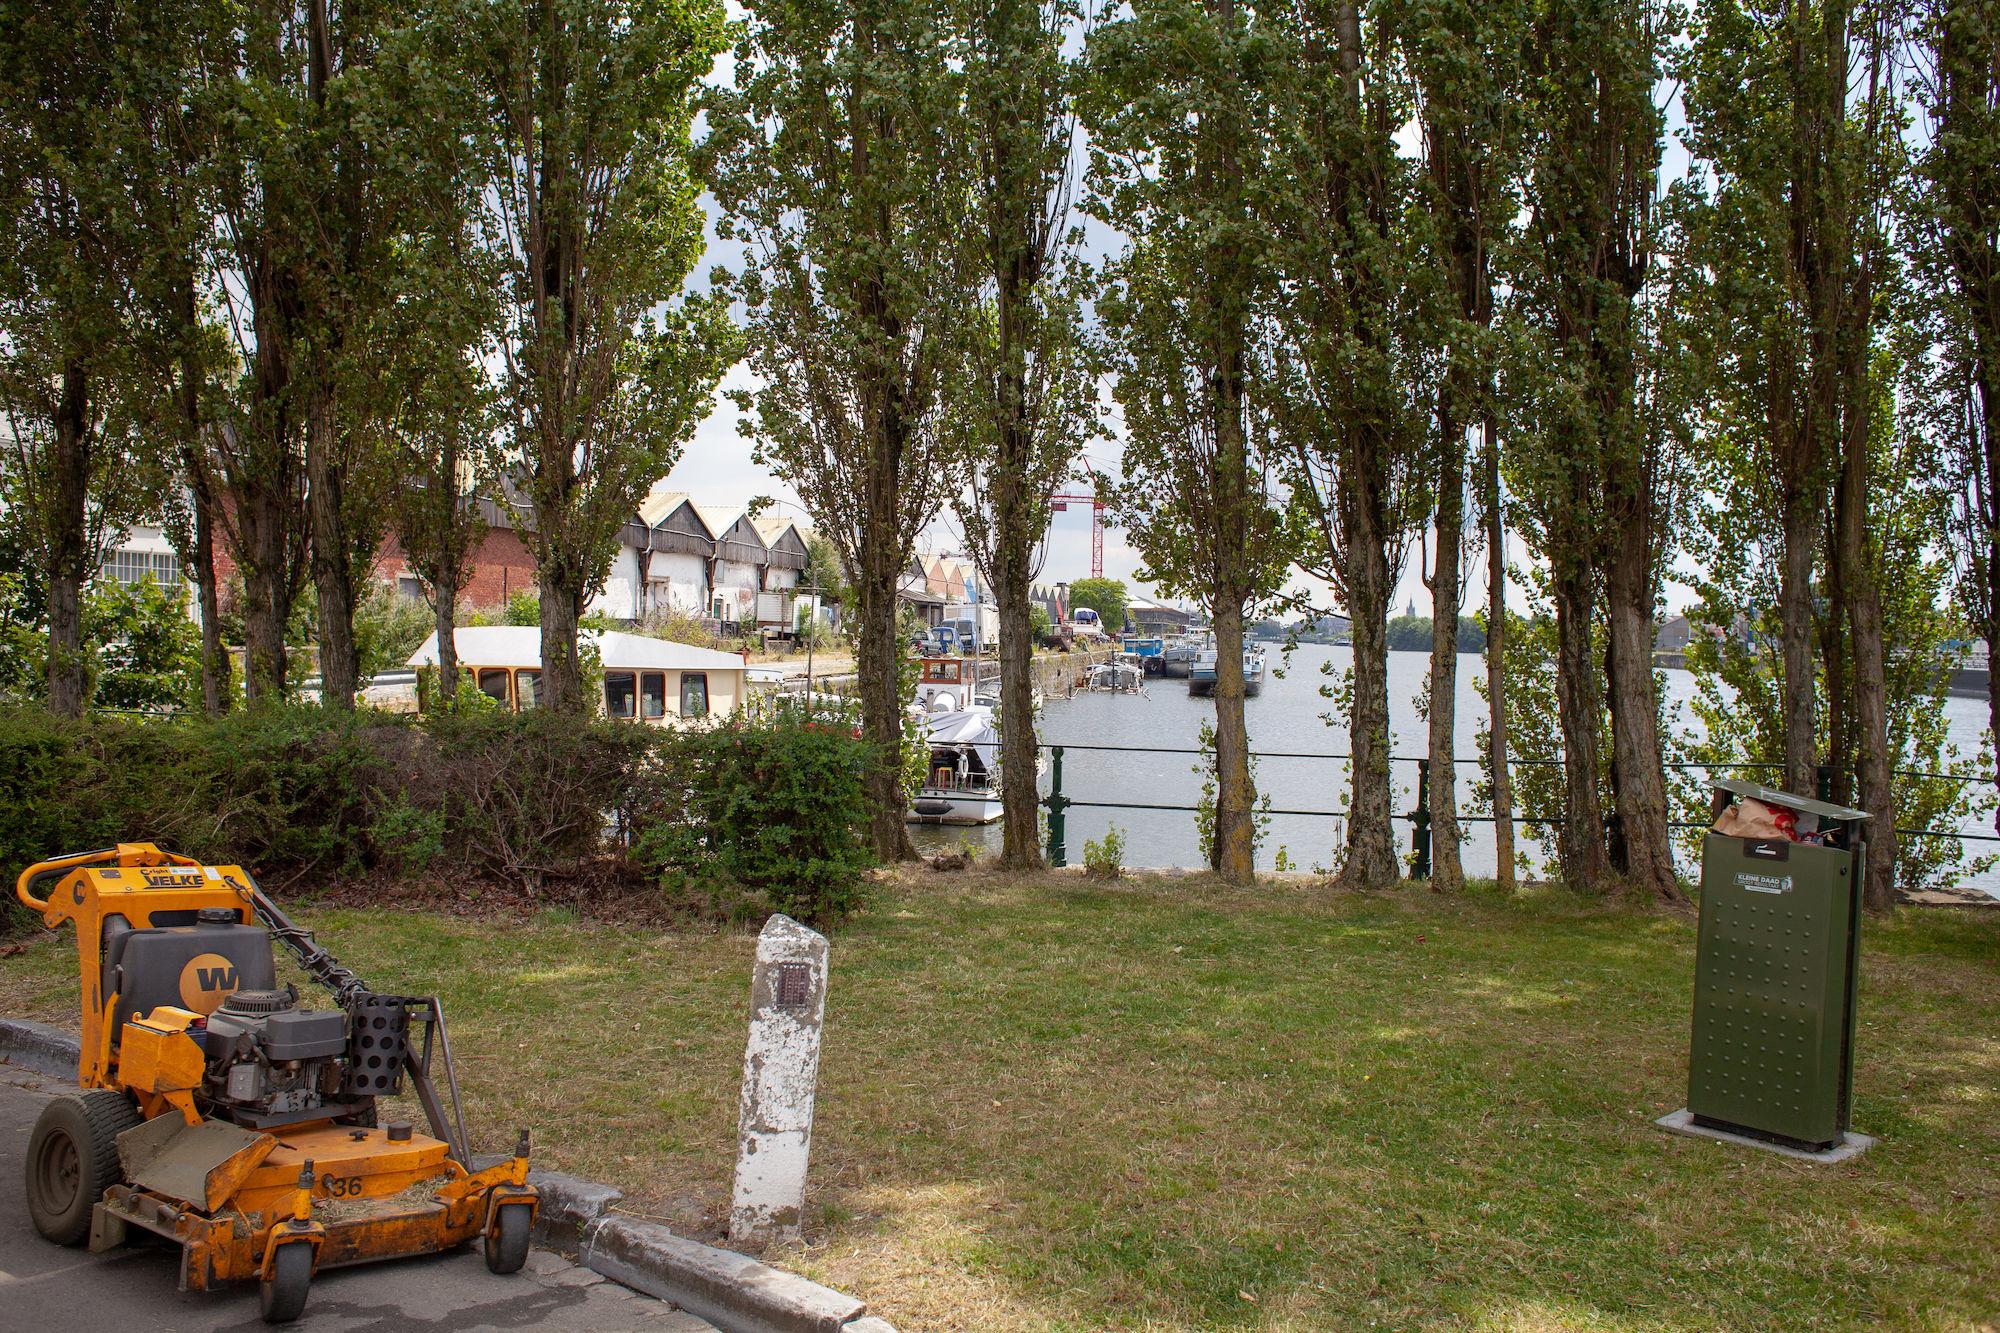 2019-07-02 Muide Meulestede prospectie Wannes_stadsvernieuwing_IMG_0384-3.jpg